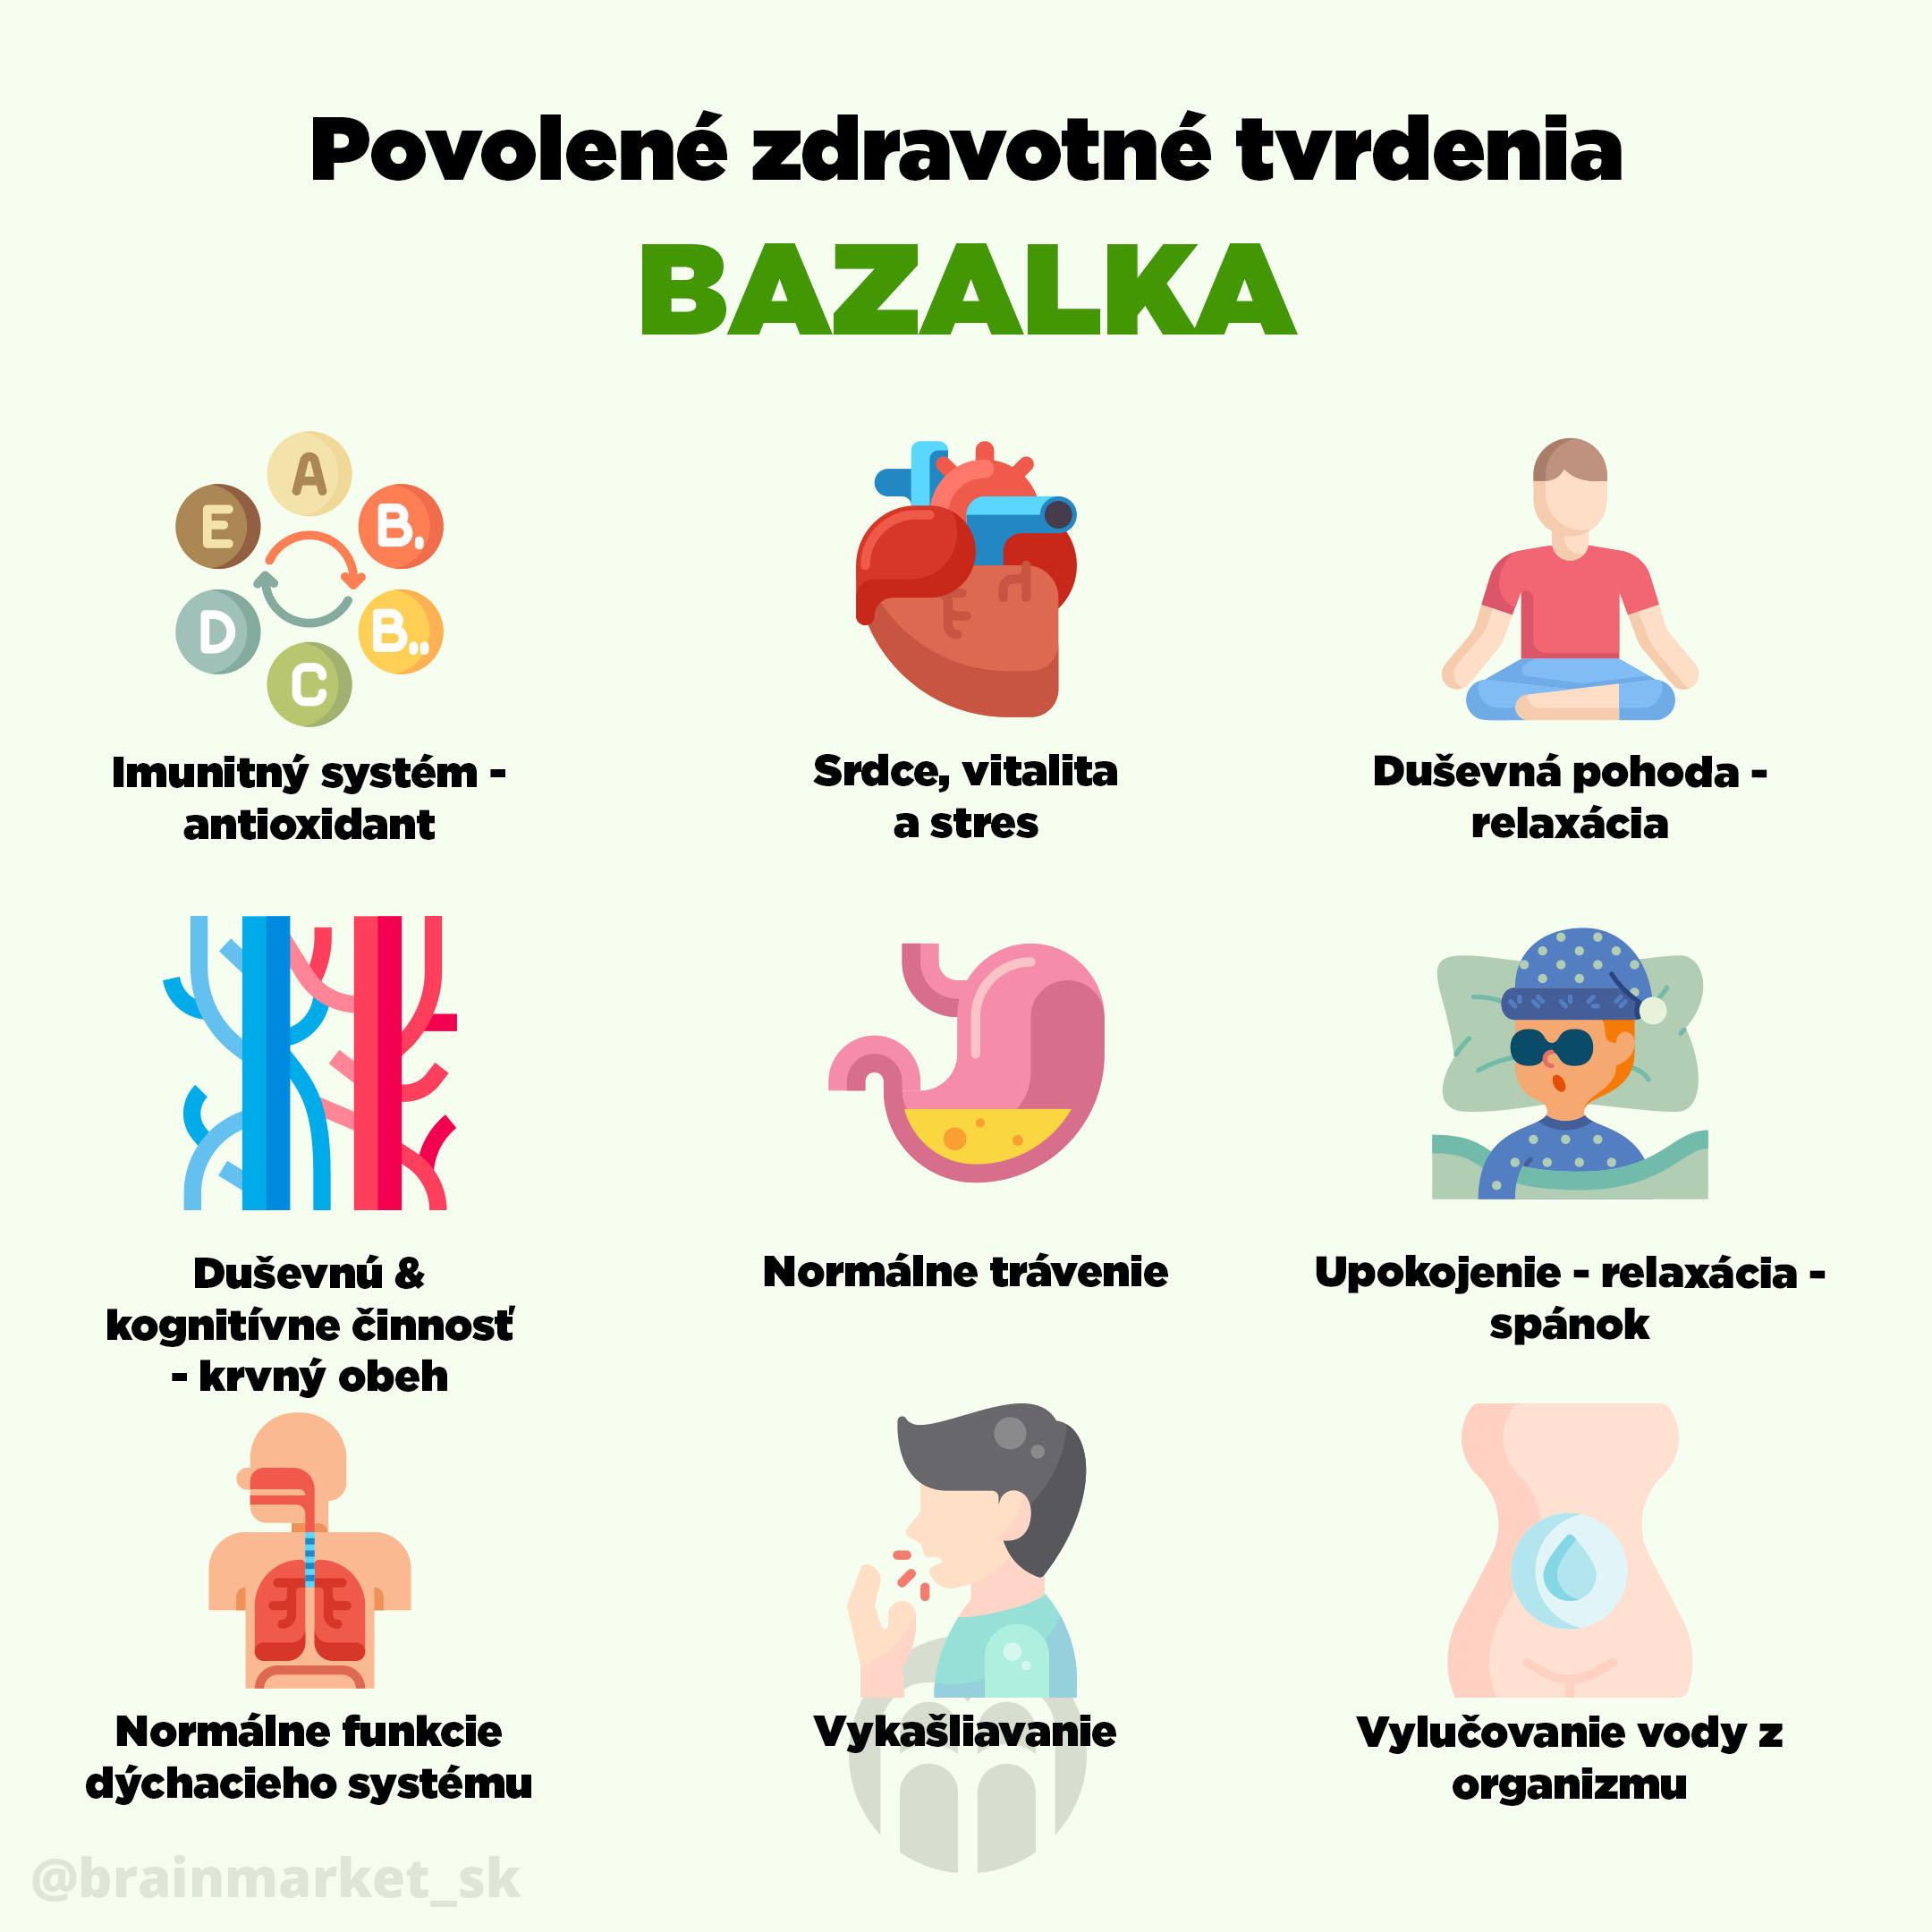 schvalena_zdrav_bazalka_infografika_brainmarket_sk